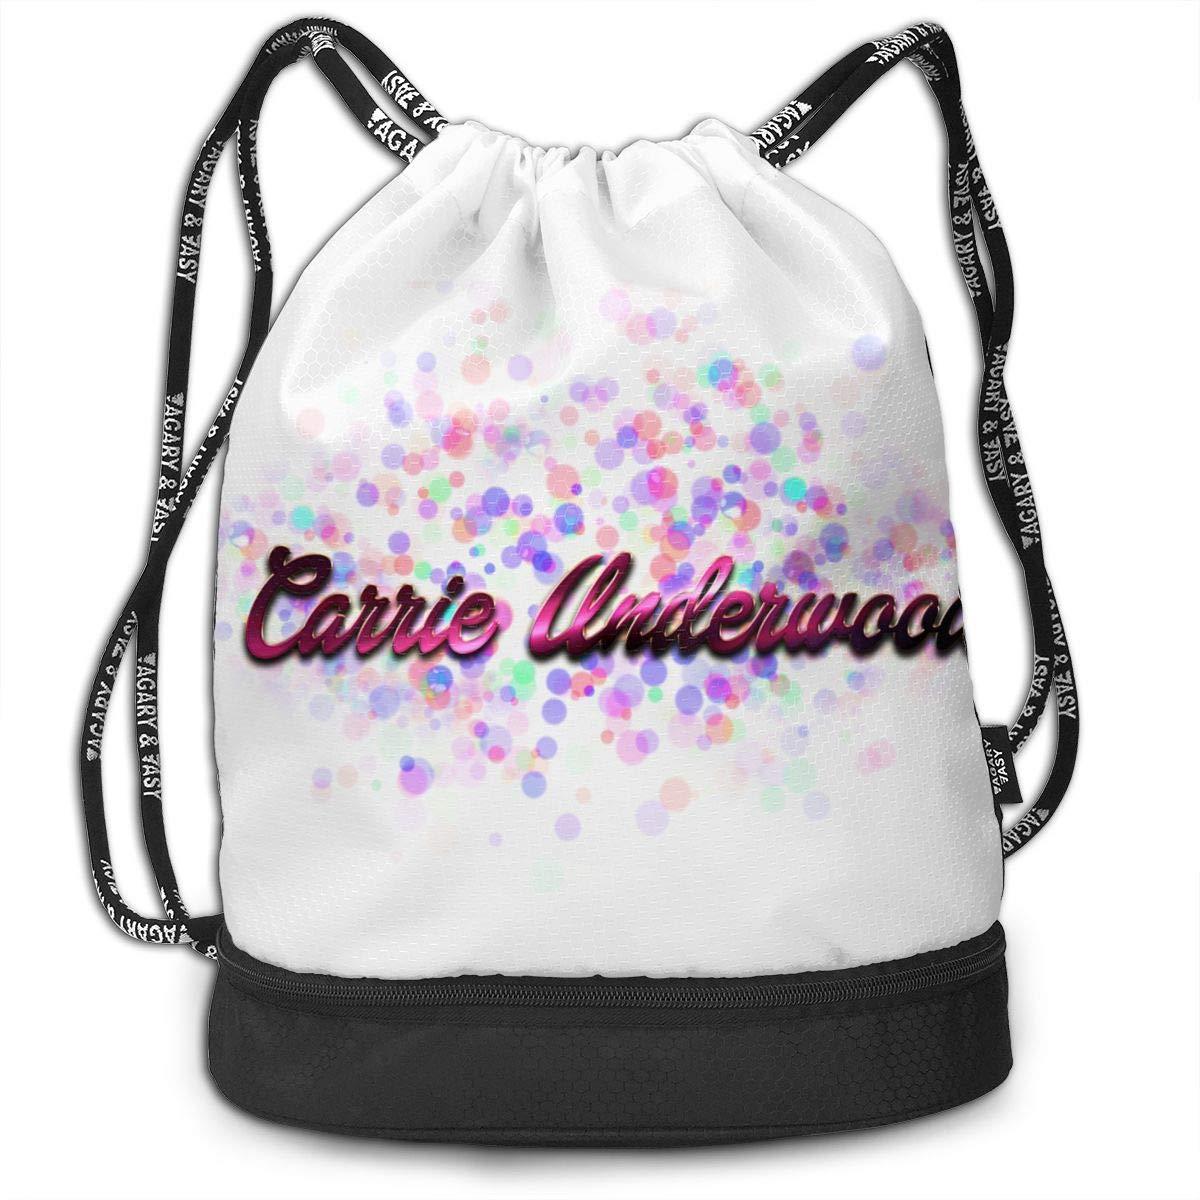 04f7413dc3c5 Amazon.com: Chenjunyi Carrie Underwood Drawstring Backpack Foldable ...